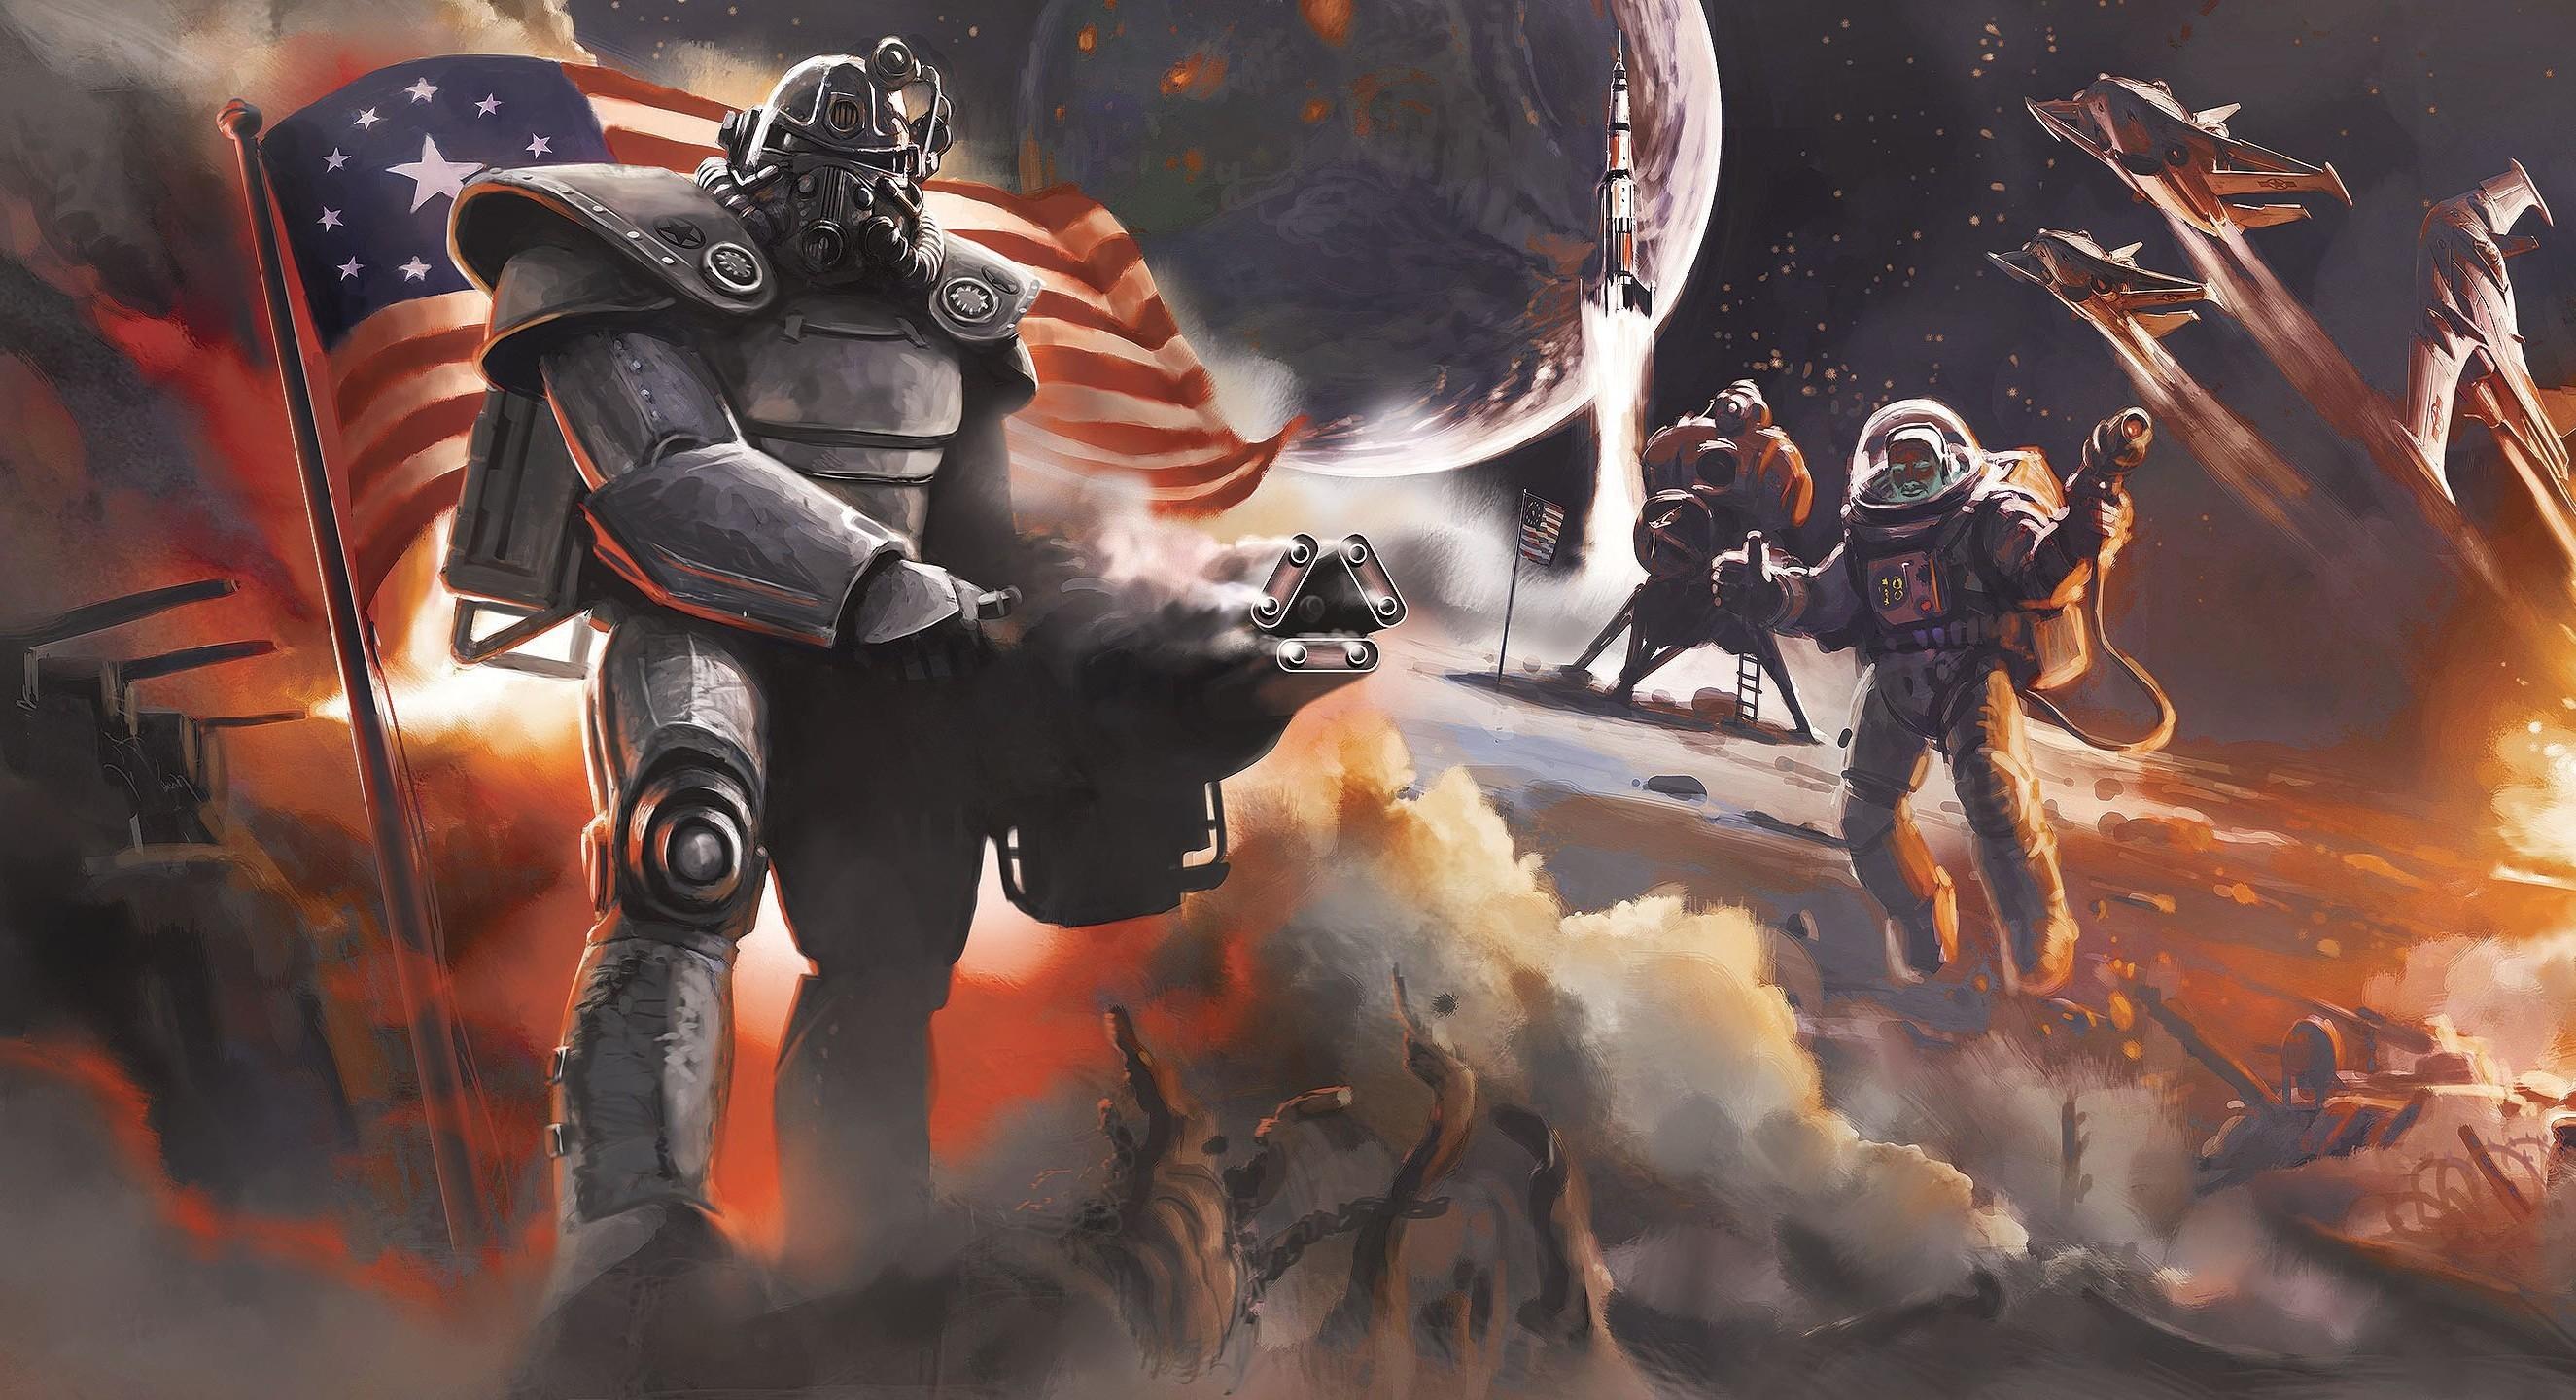 Fallout 4 Concept Art Wallpaper (74+ Images